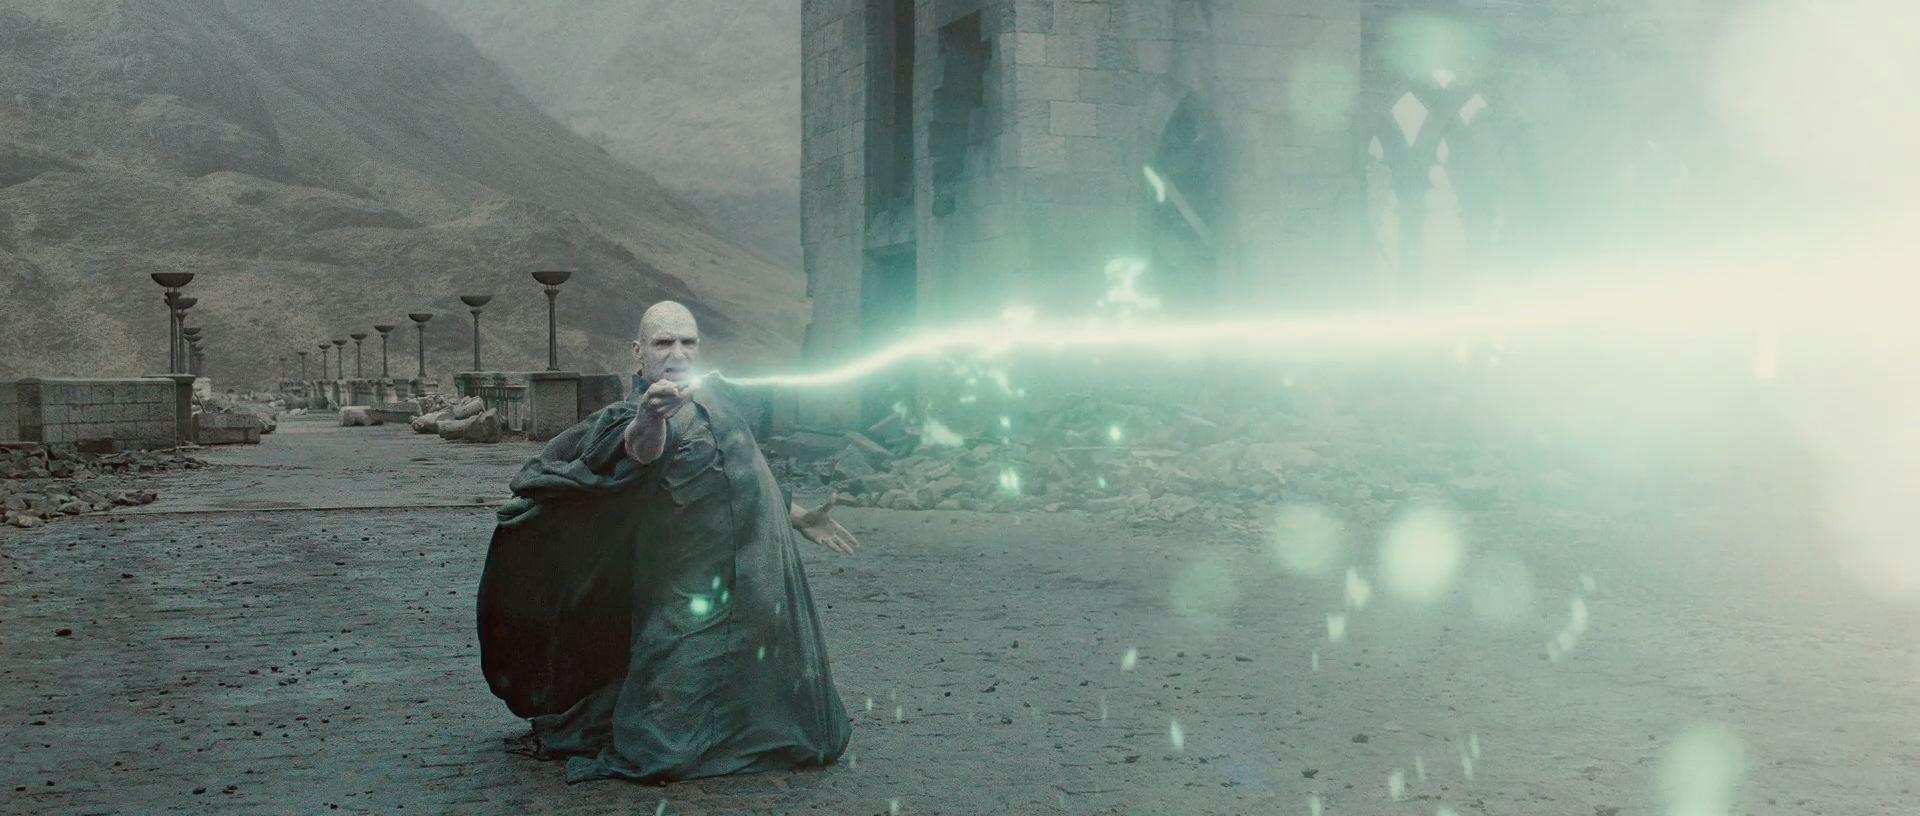 Harry Potter BlogHogwarts HP7 2 Trailer 85